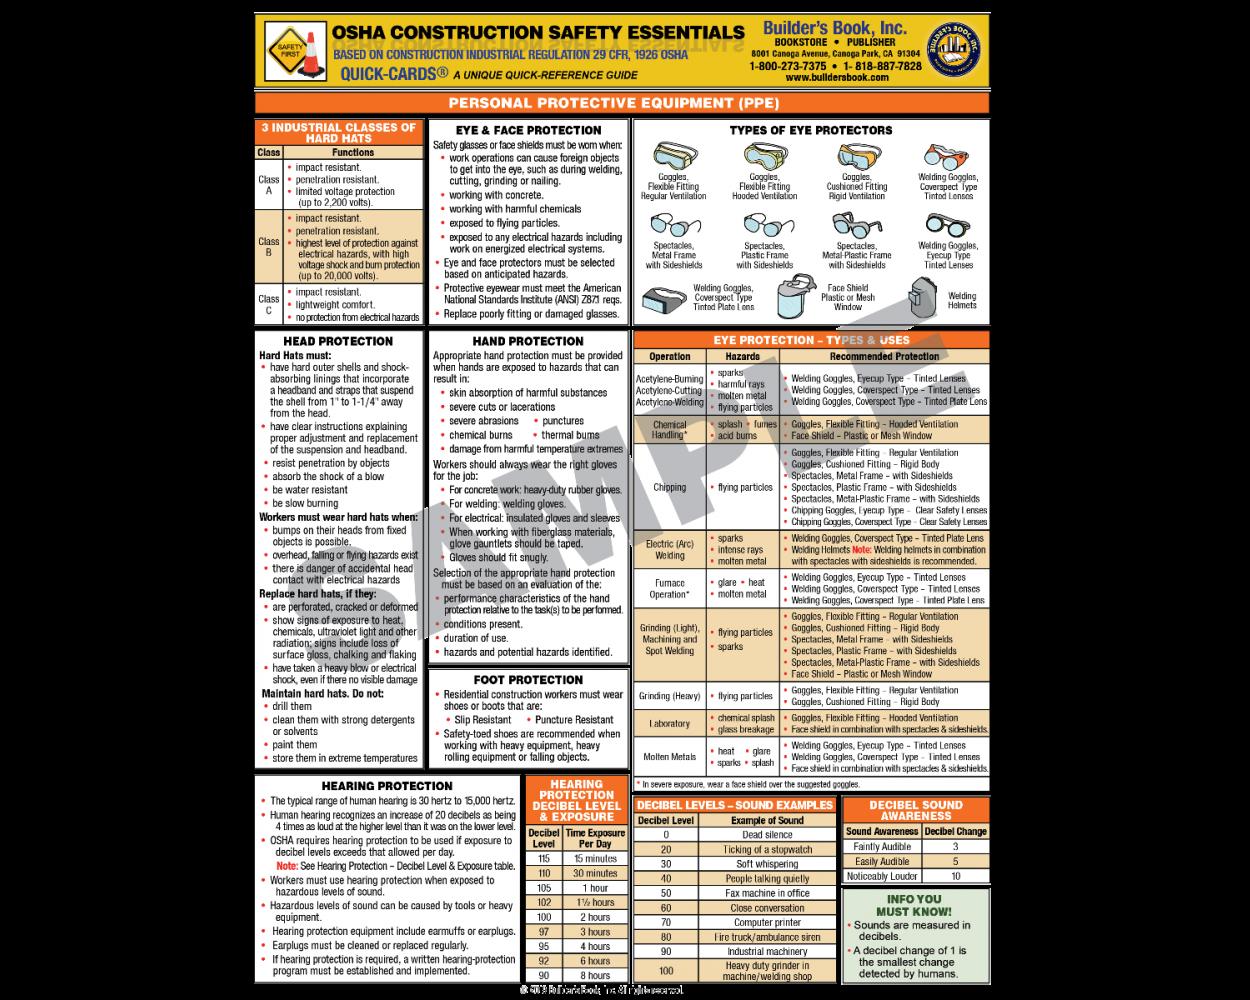 OSHA Construction Safety Essentials